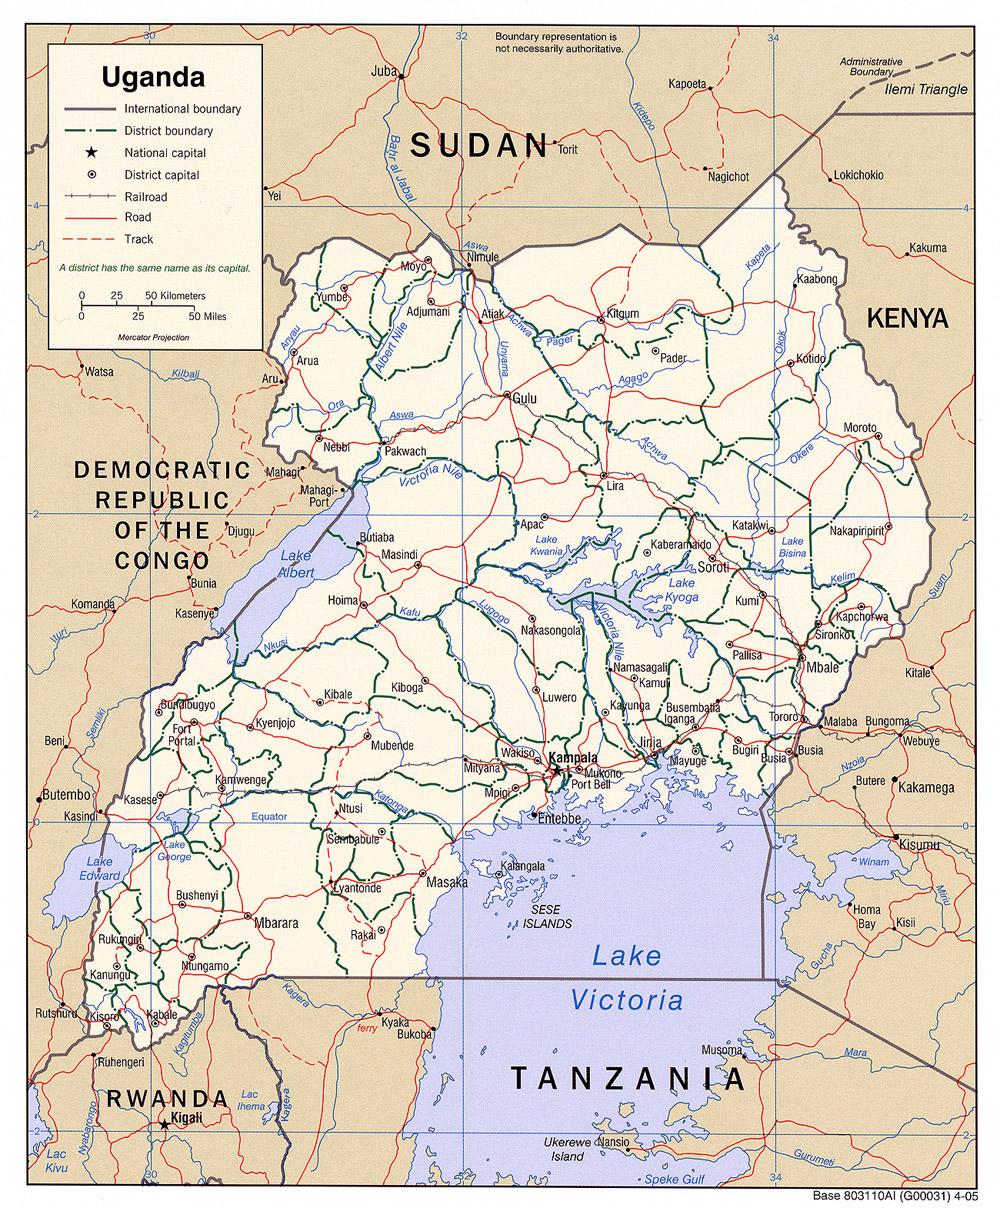 Uganda in Focus Gavins Africa Blog